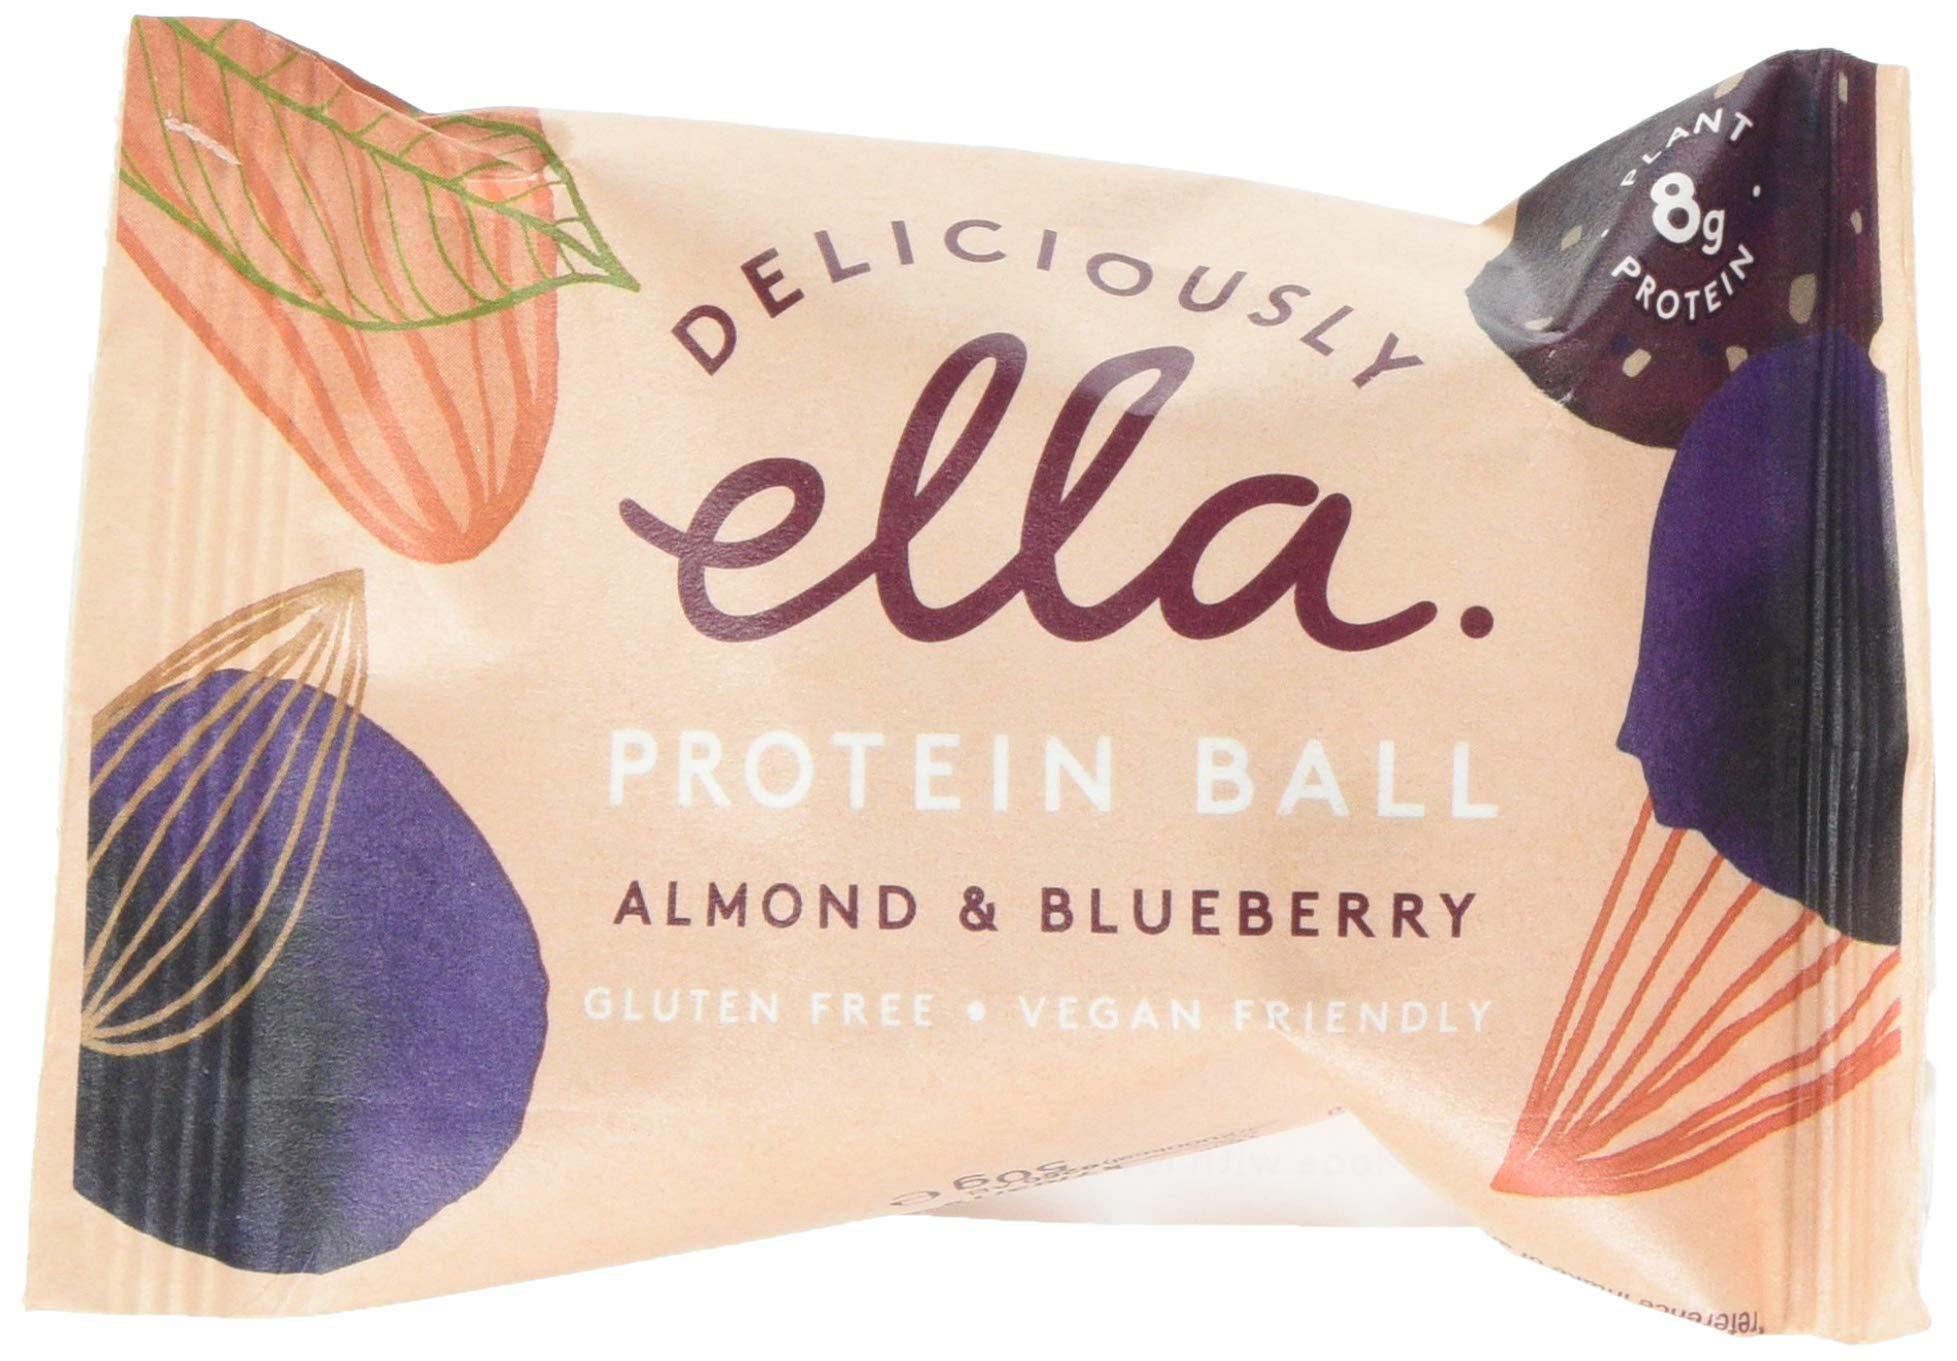 Deliciously Ella - Almond & Blueberry Protein Ball, Gluten-Free, Vegan Friendly, Healthy Snack, 50g (12 Balls) 1